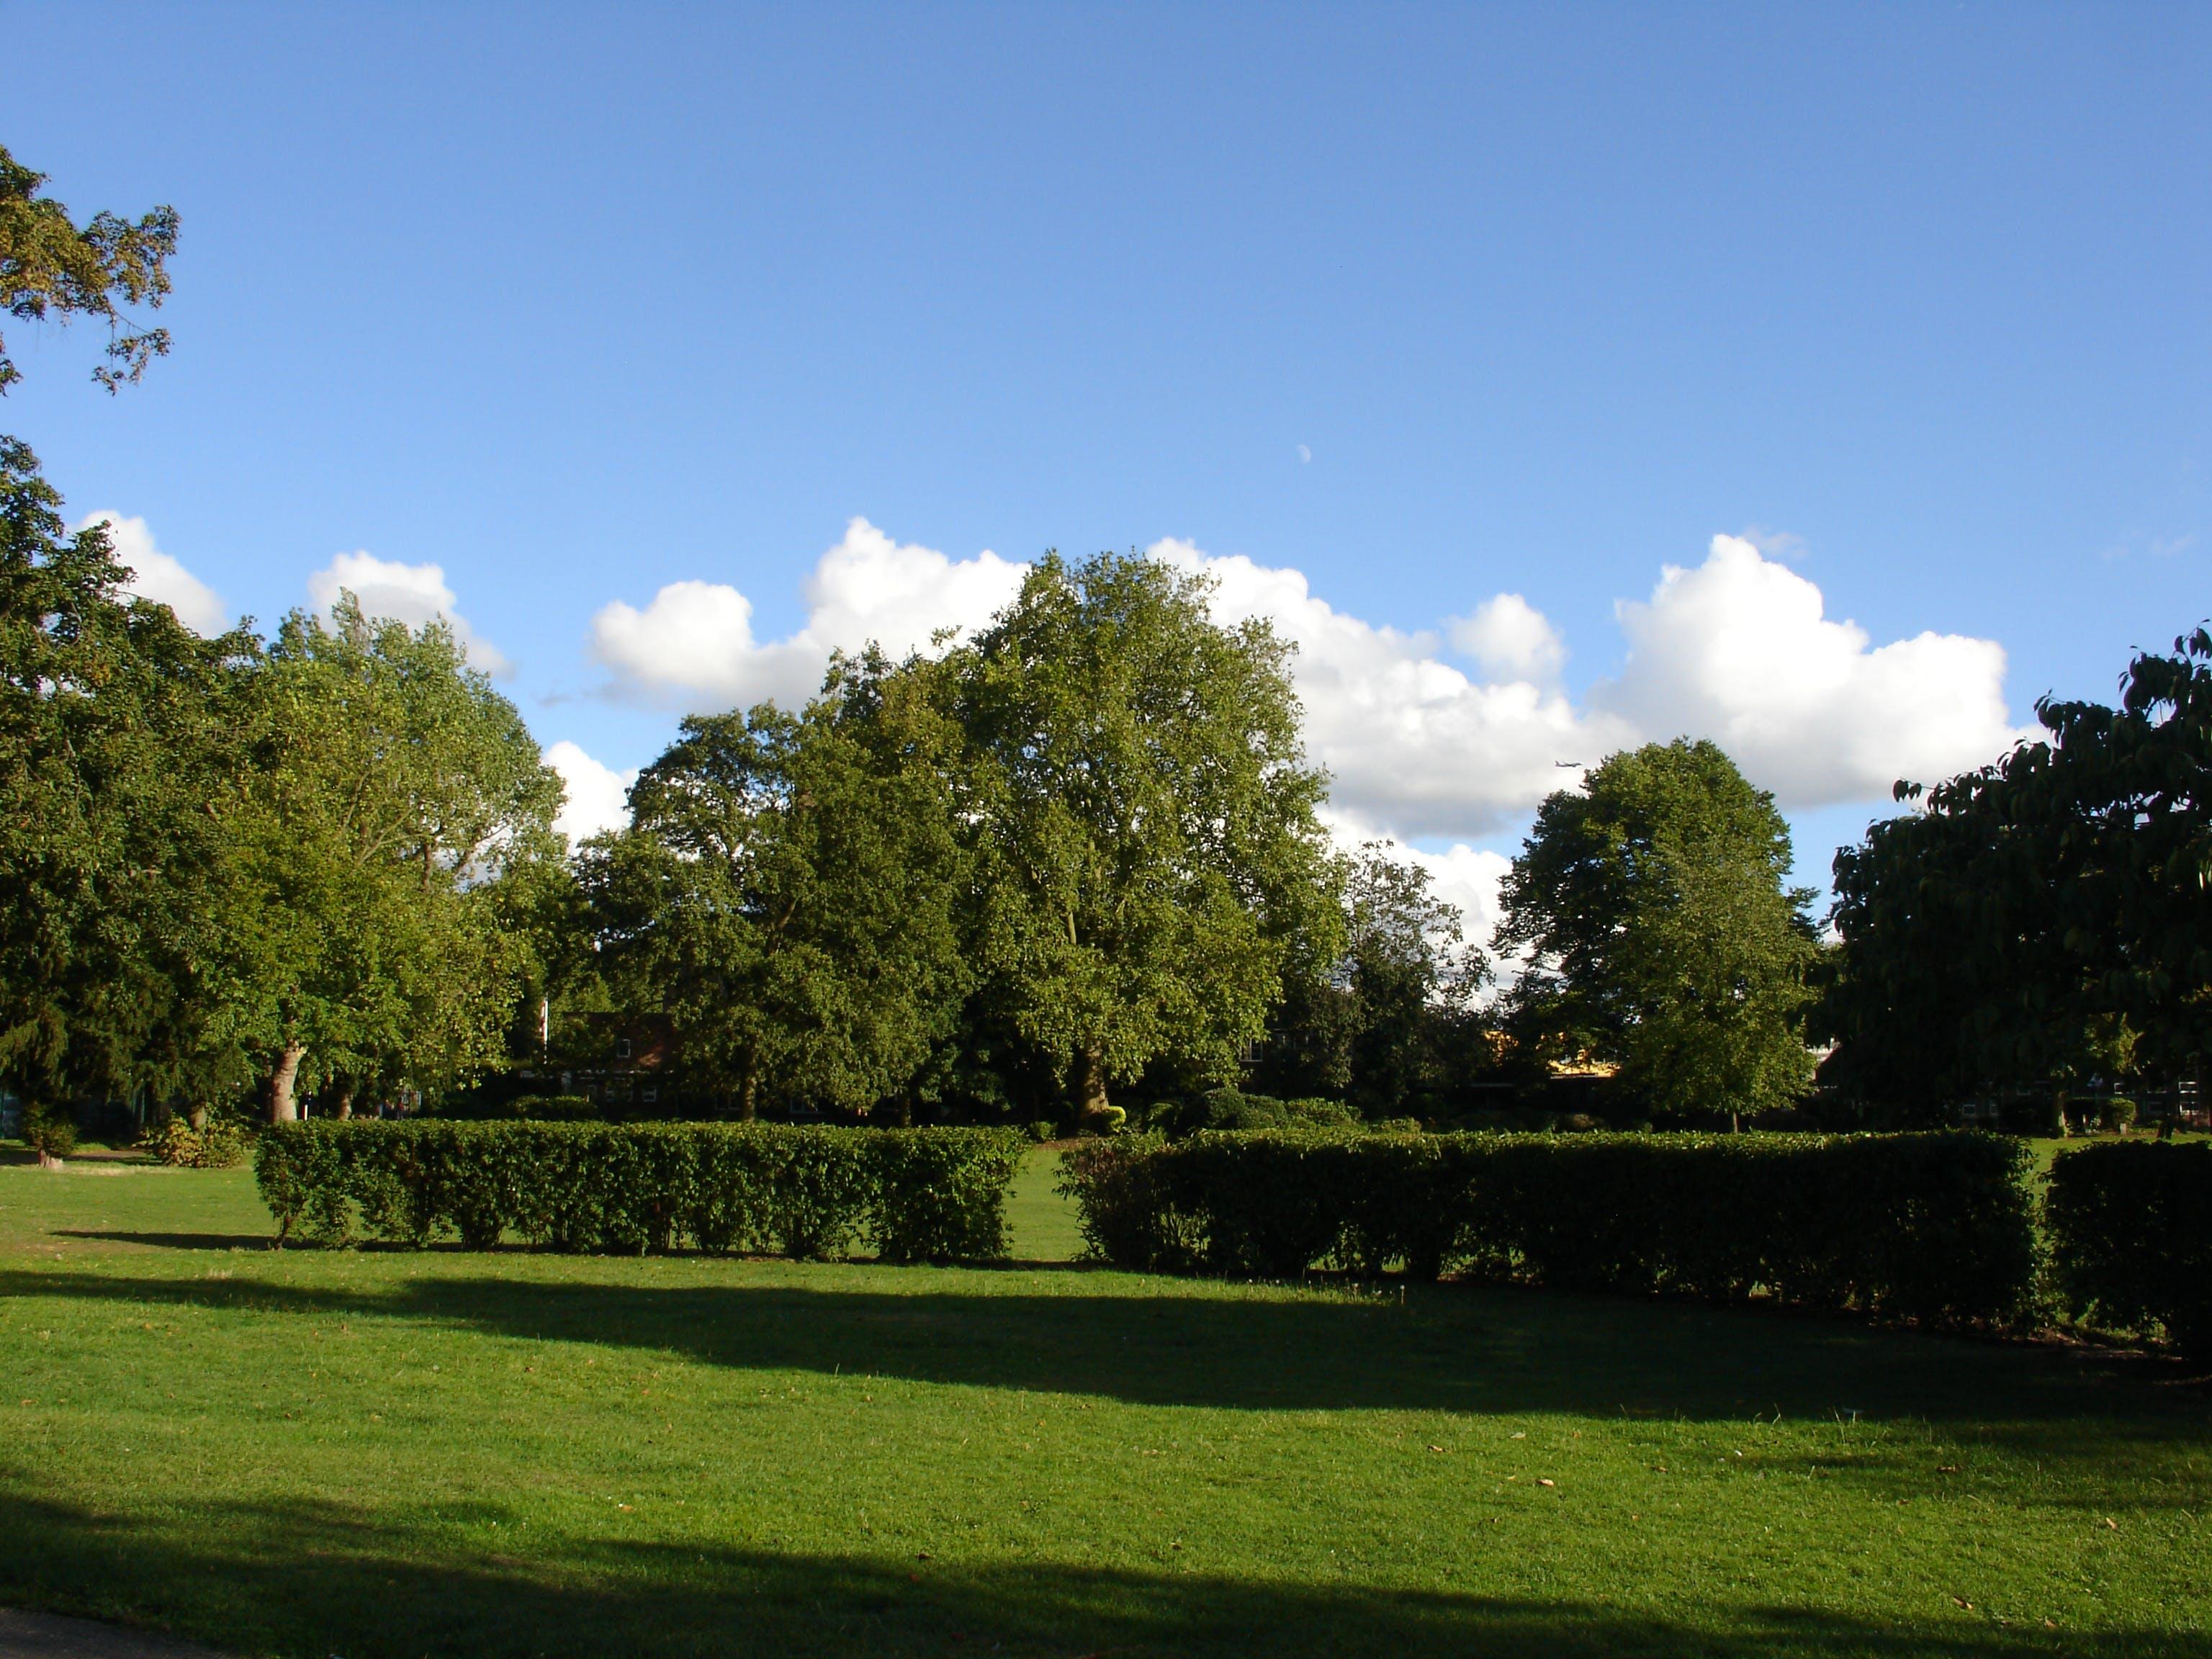 Free stock photo of sky, trees, grass, park